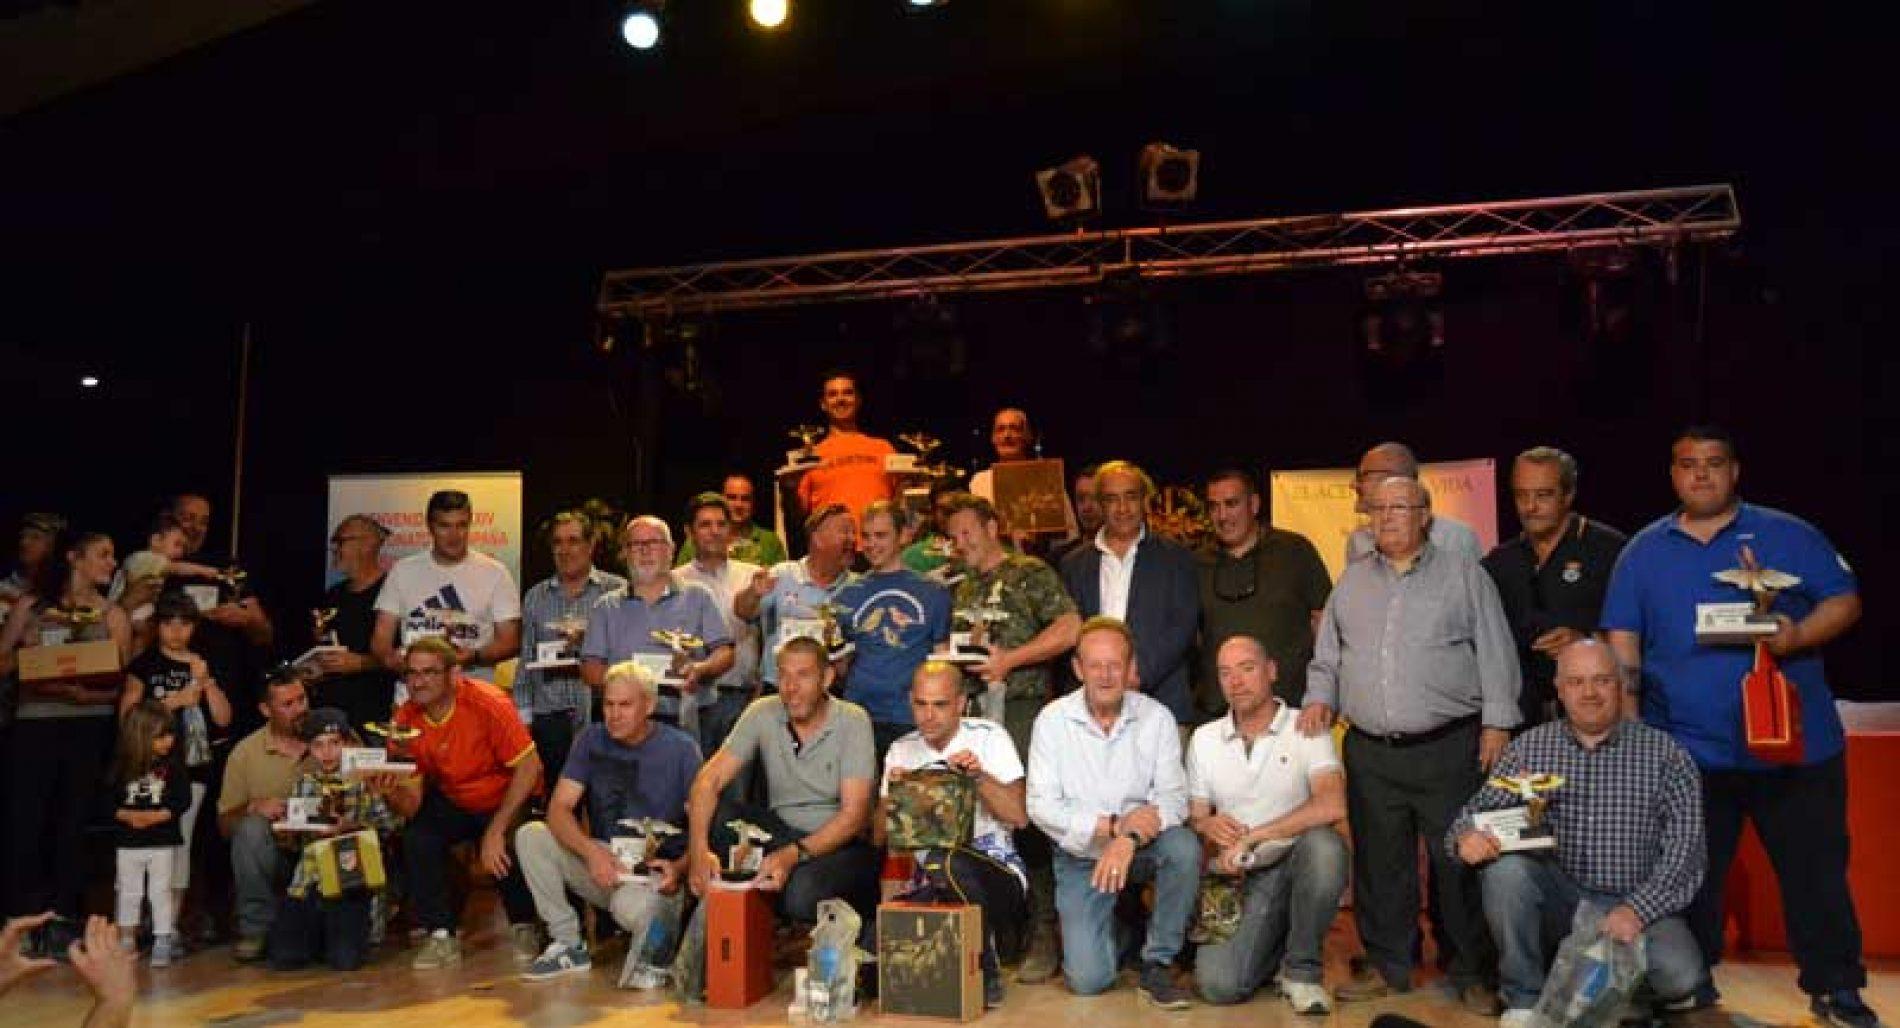 266 aves en el XXIV Campeonato de España de Silvestrismo